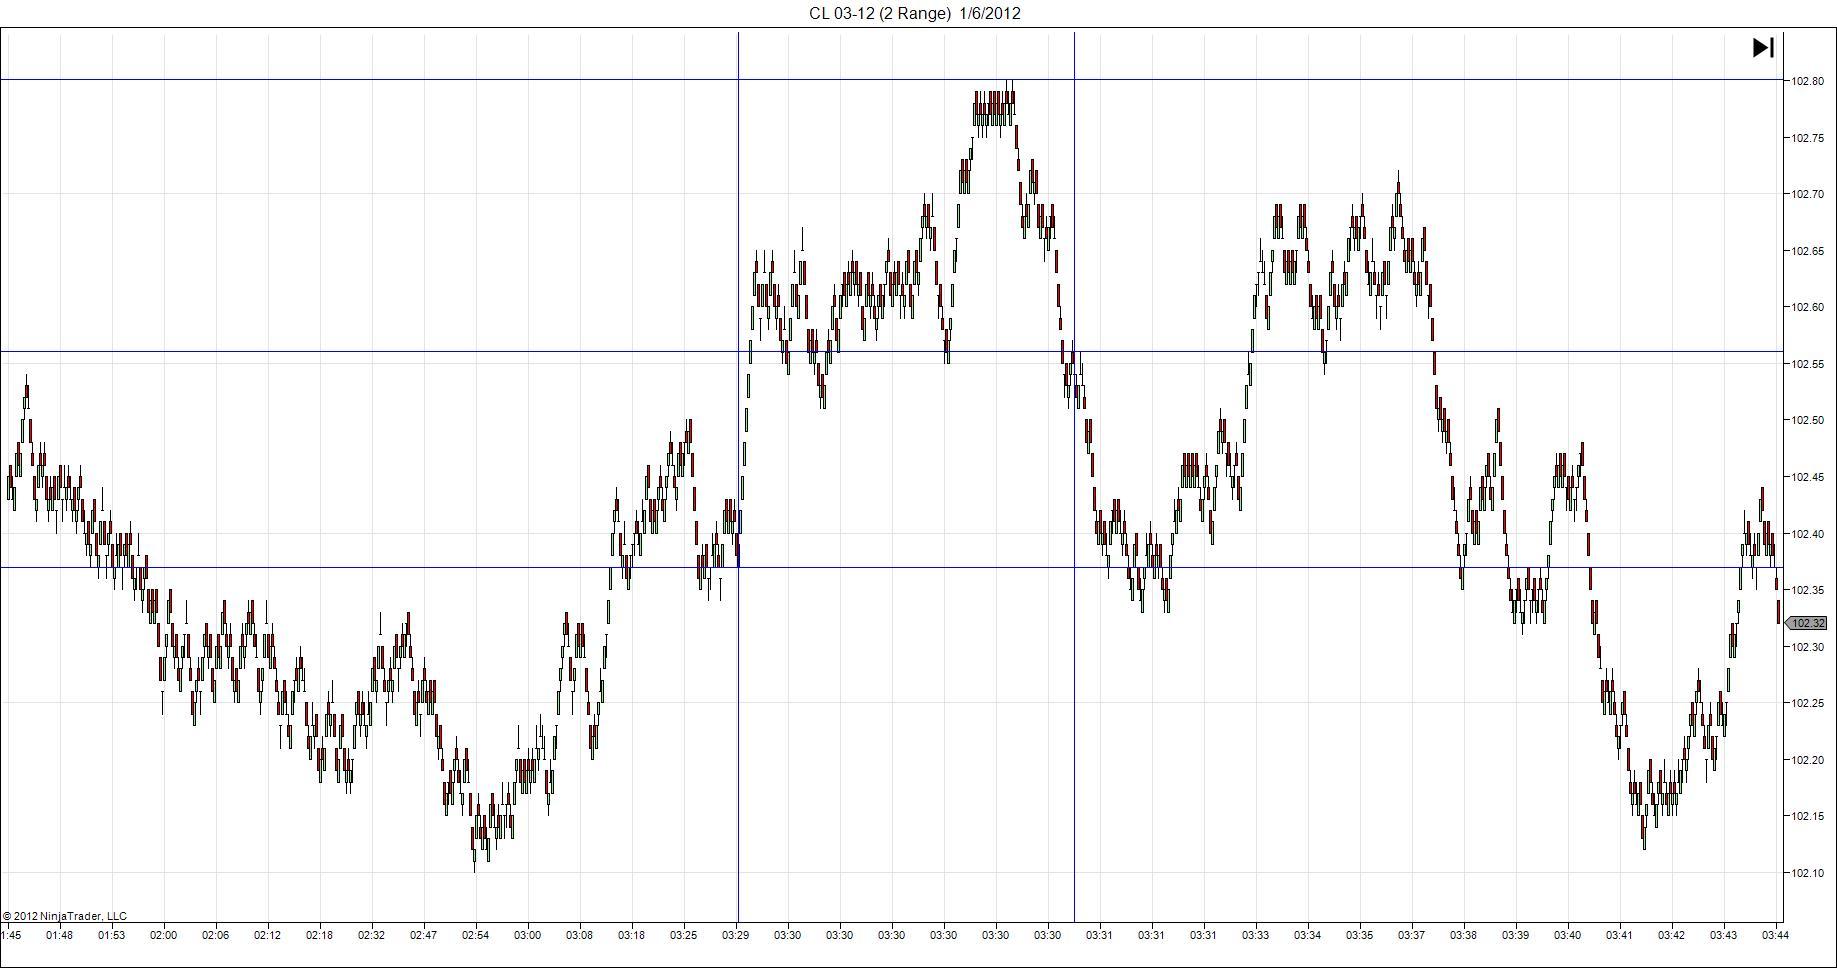 CL 03 12 (2 Range) 01.06.12